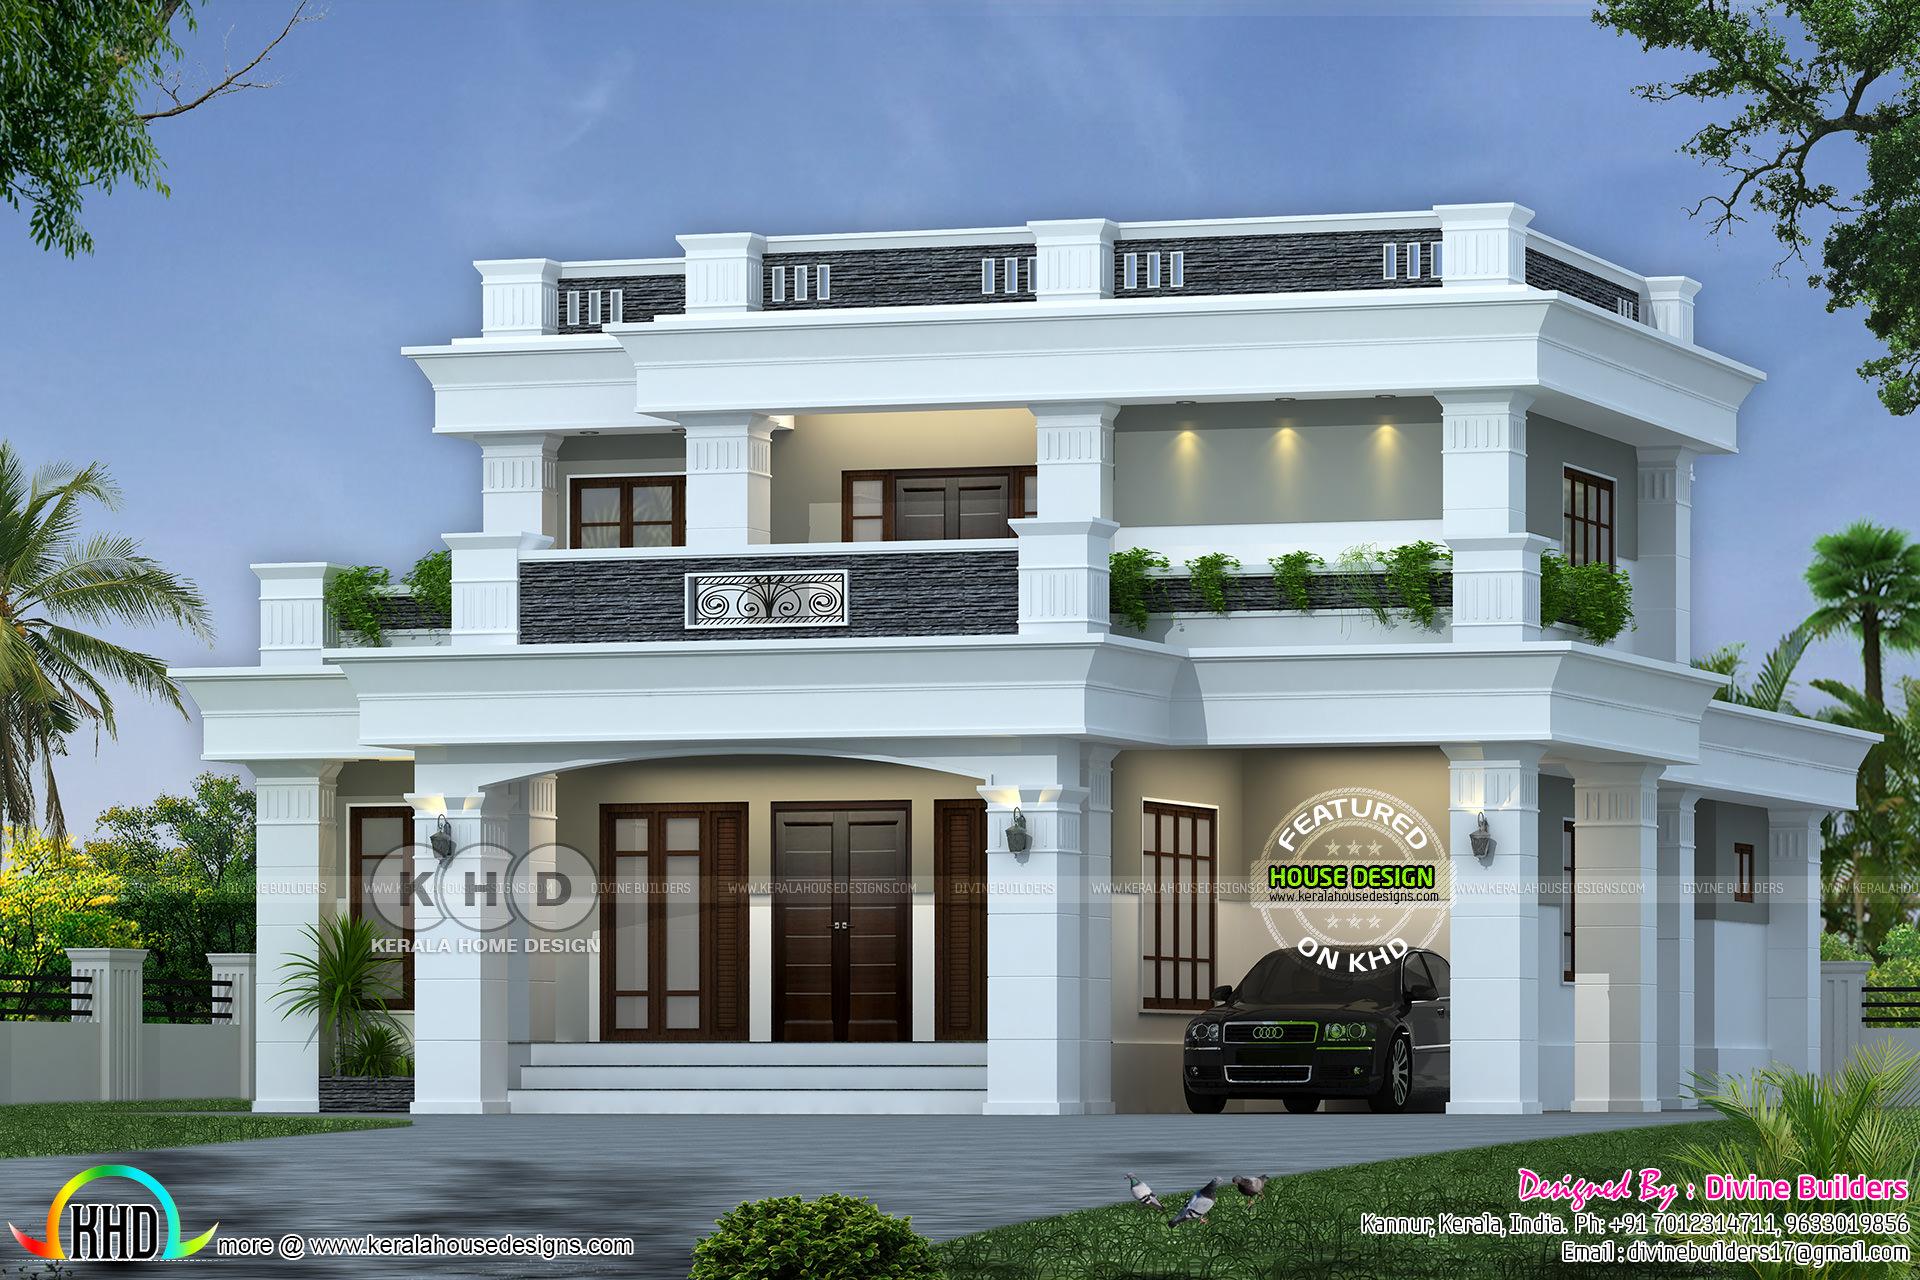 Decorative Flat Roof : Kerala home design and floor plans